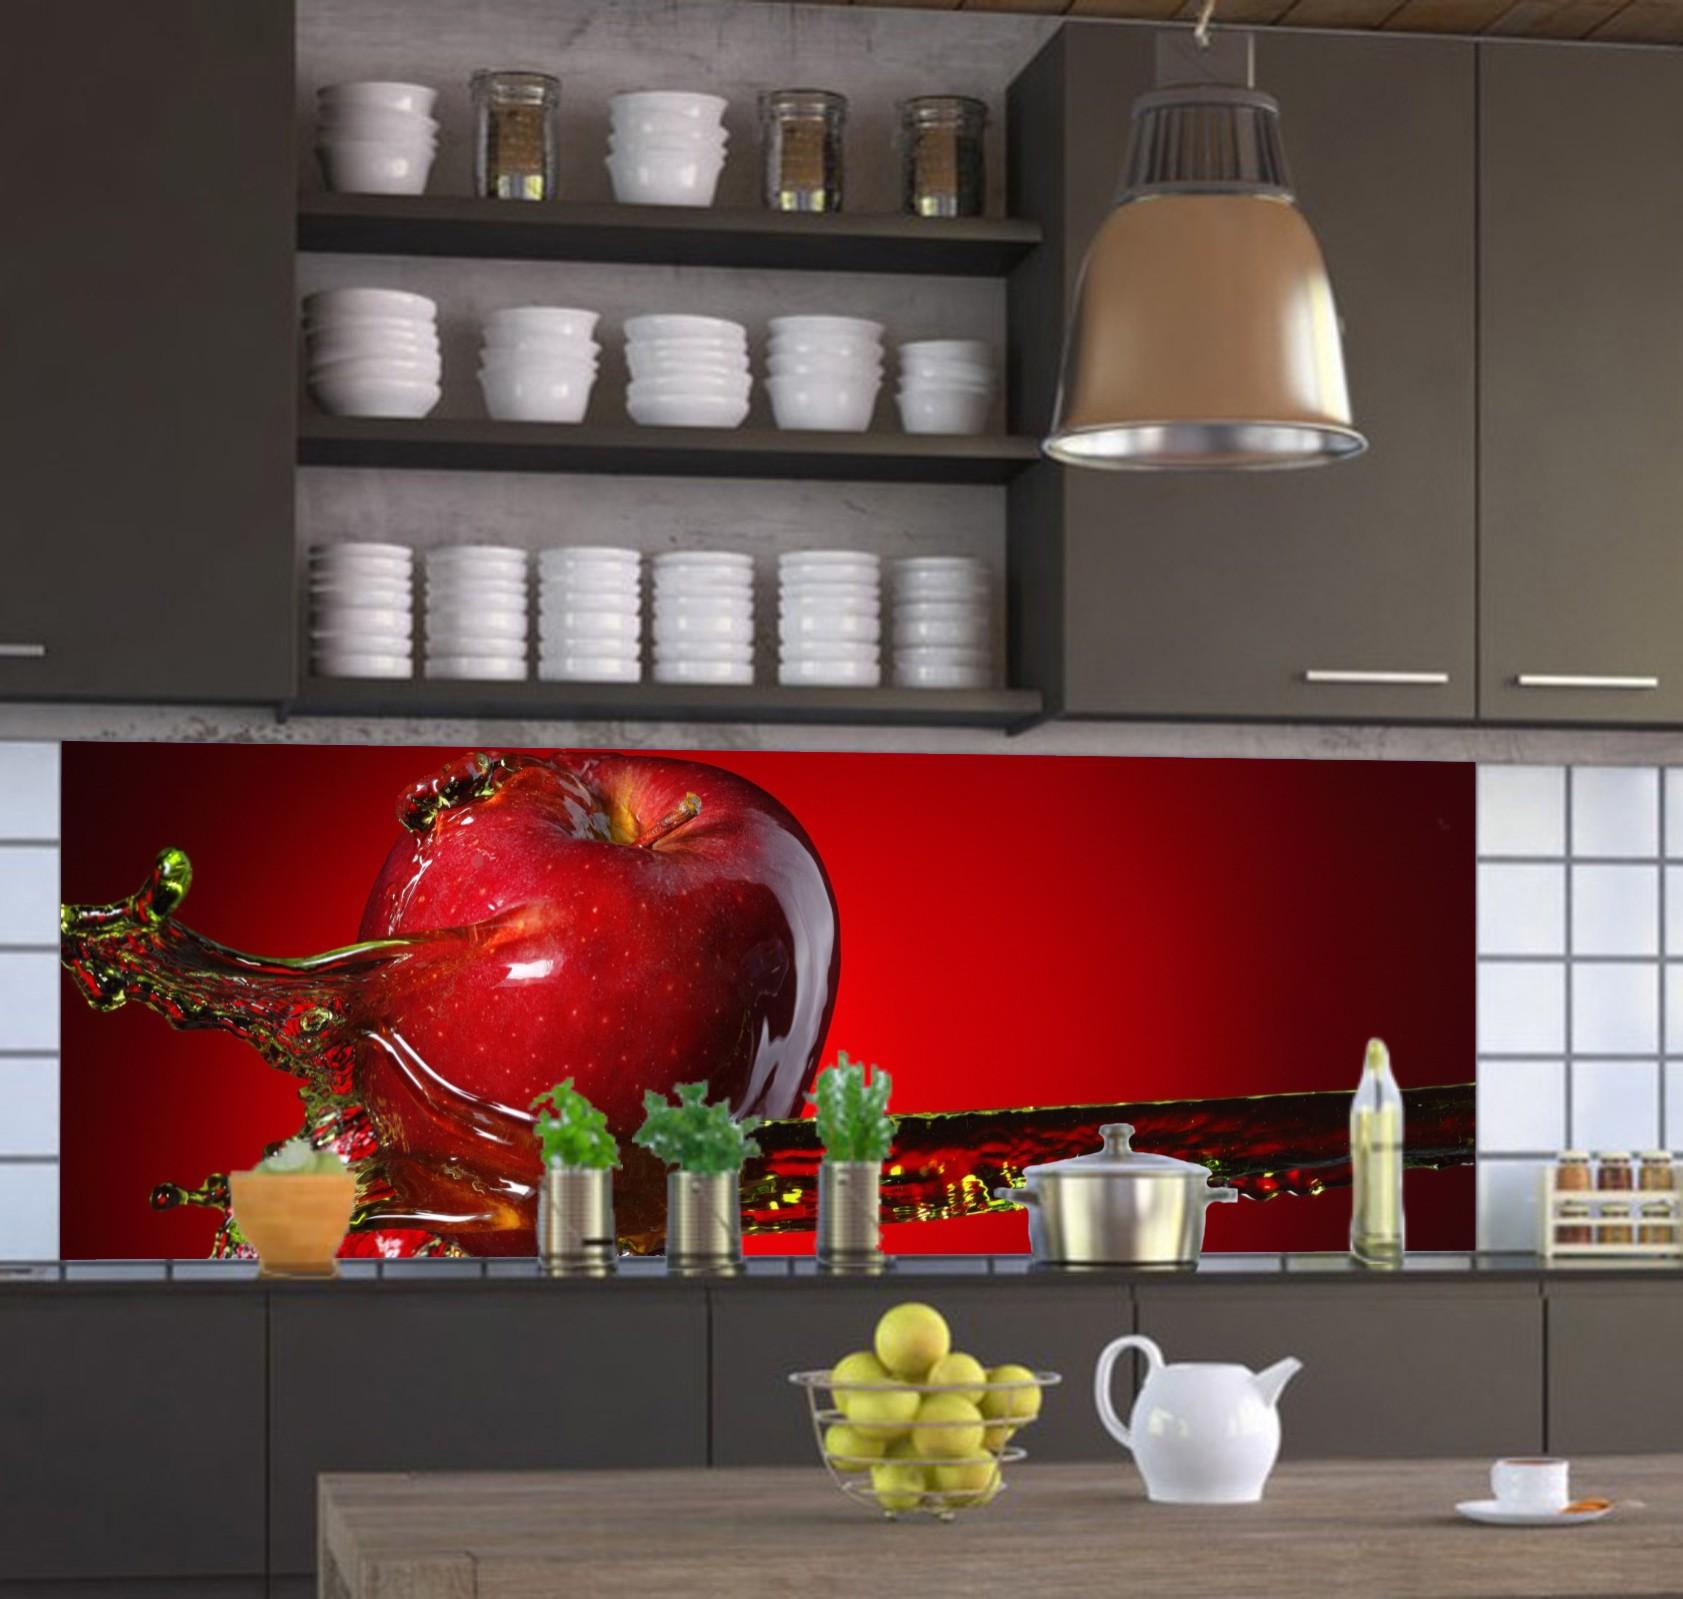 Küchenrückwand nach Maß - Spritzschutz